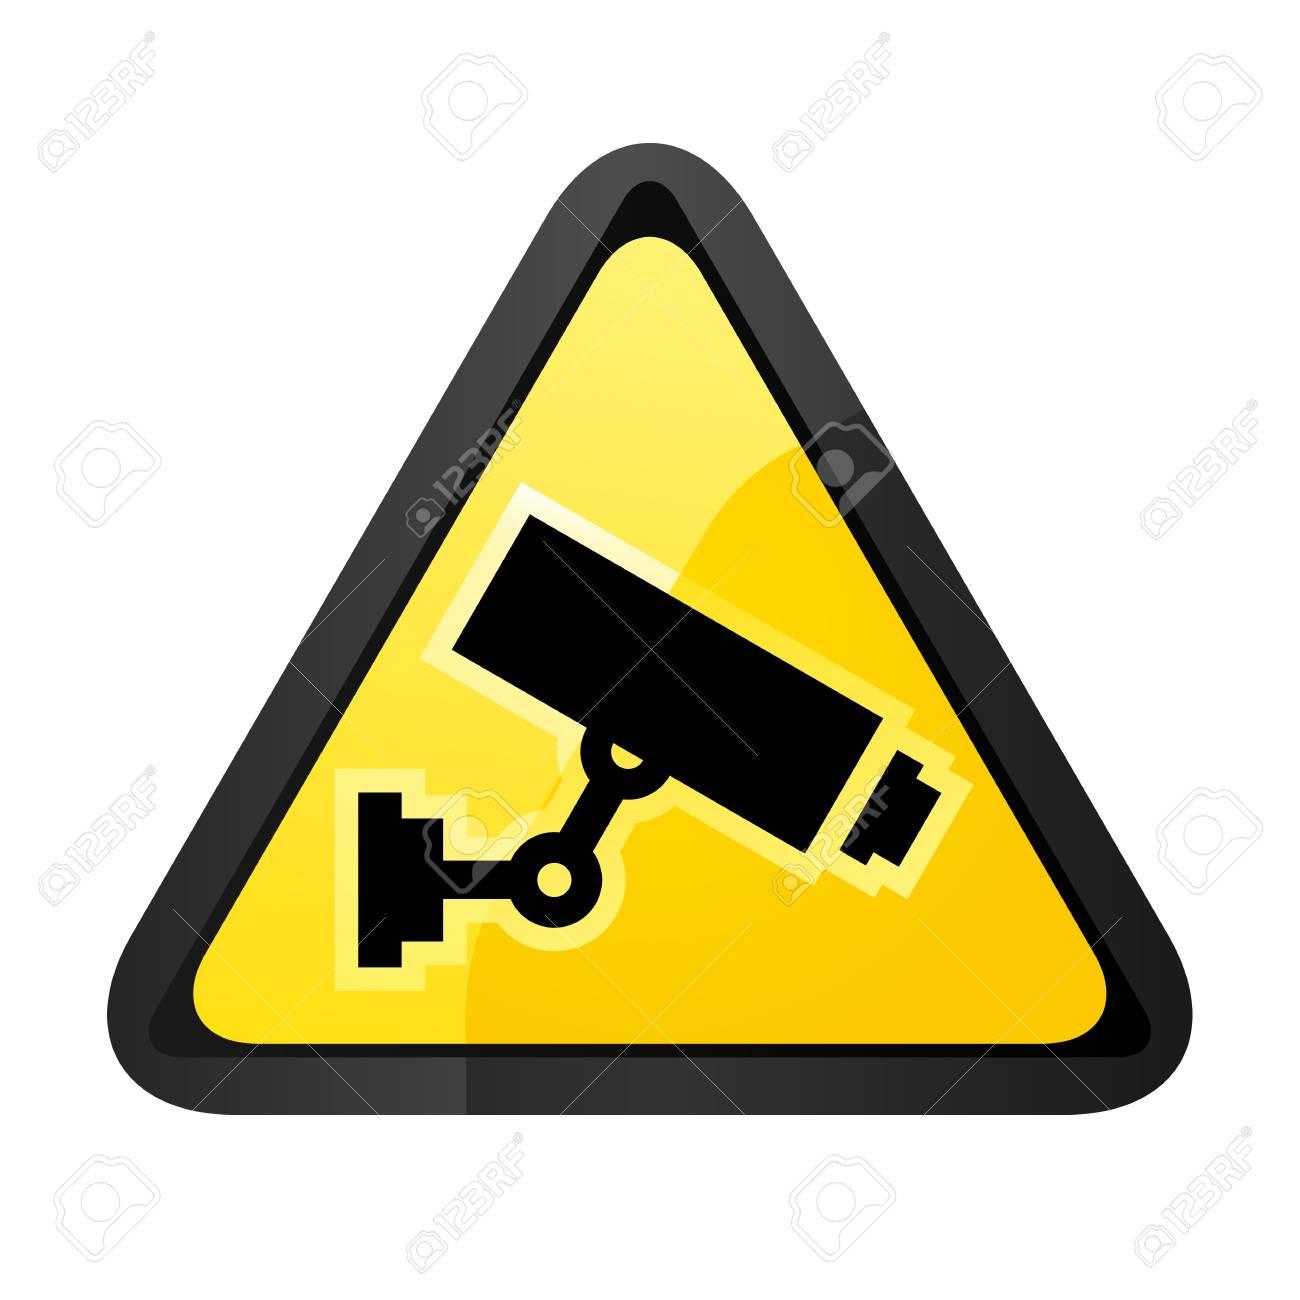 Black surveillance camera on a yellow triangular shape - 92437501